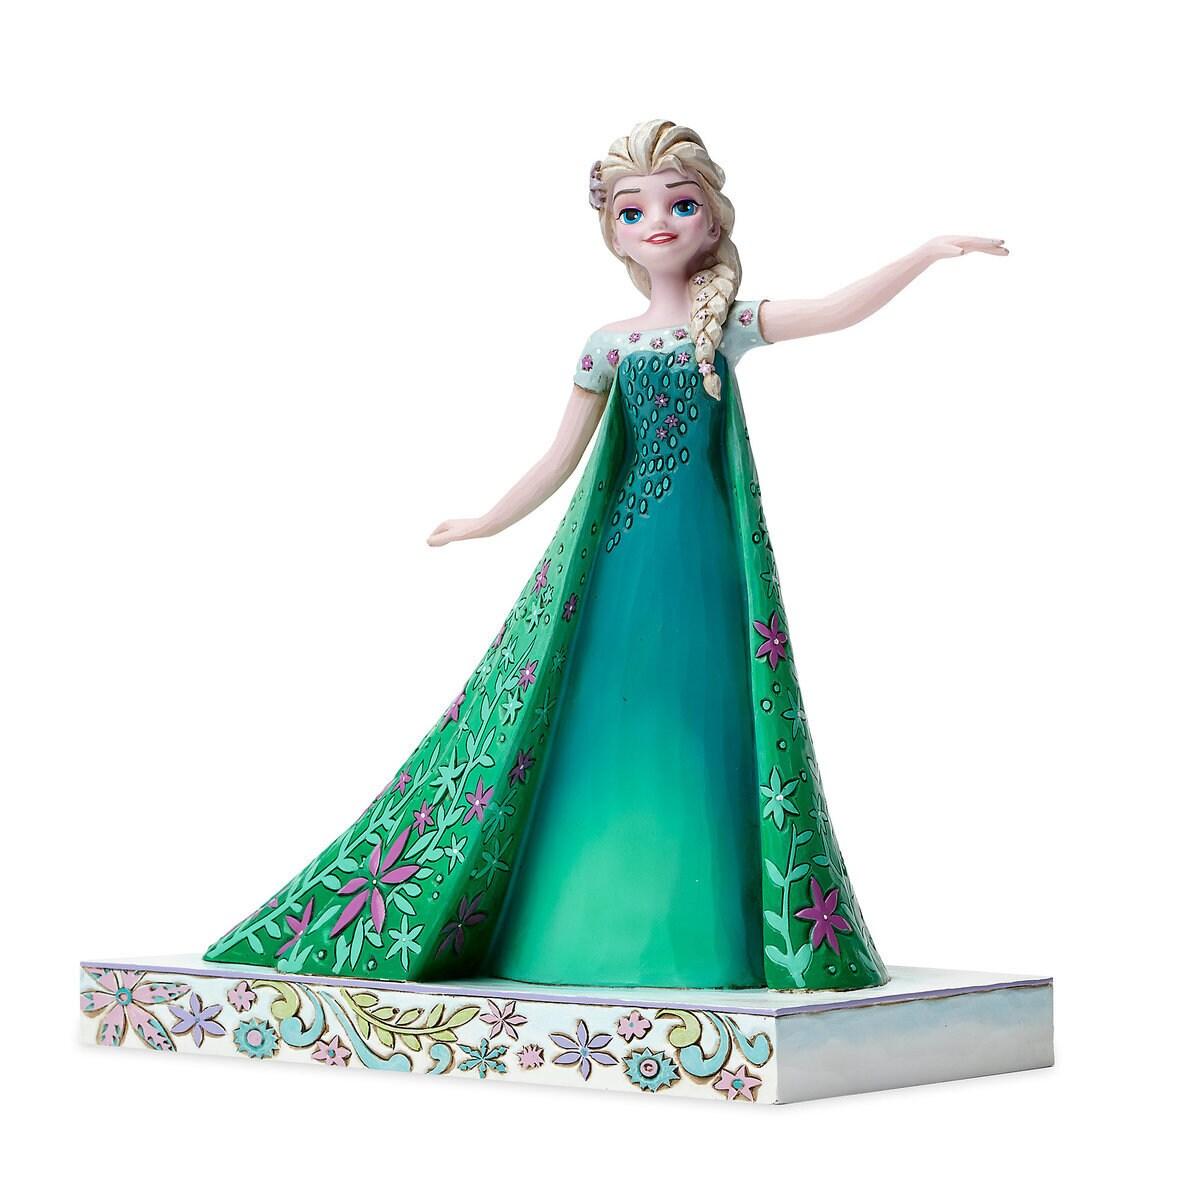 a1cdcc26744 Product Image of Elsa Figure by Jim Shore - Frozen Fever   1